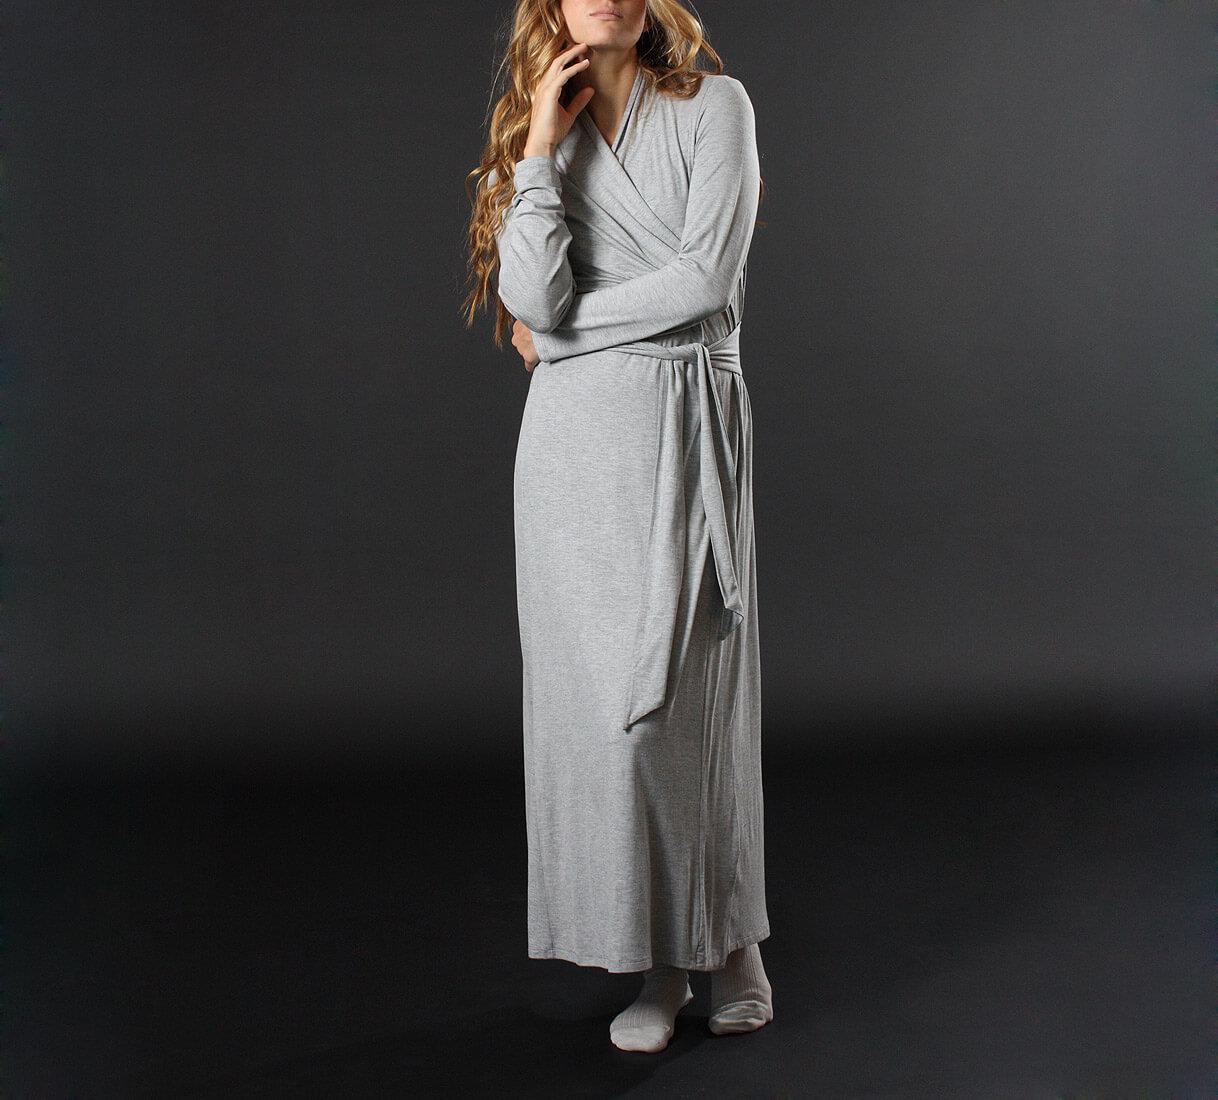 $95 http://www.btslingerie.com/luxury-knit-long-robe-heather-grey-matchplay.html?a_aid=4d9660cc79457&a_bid=1f19a139